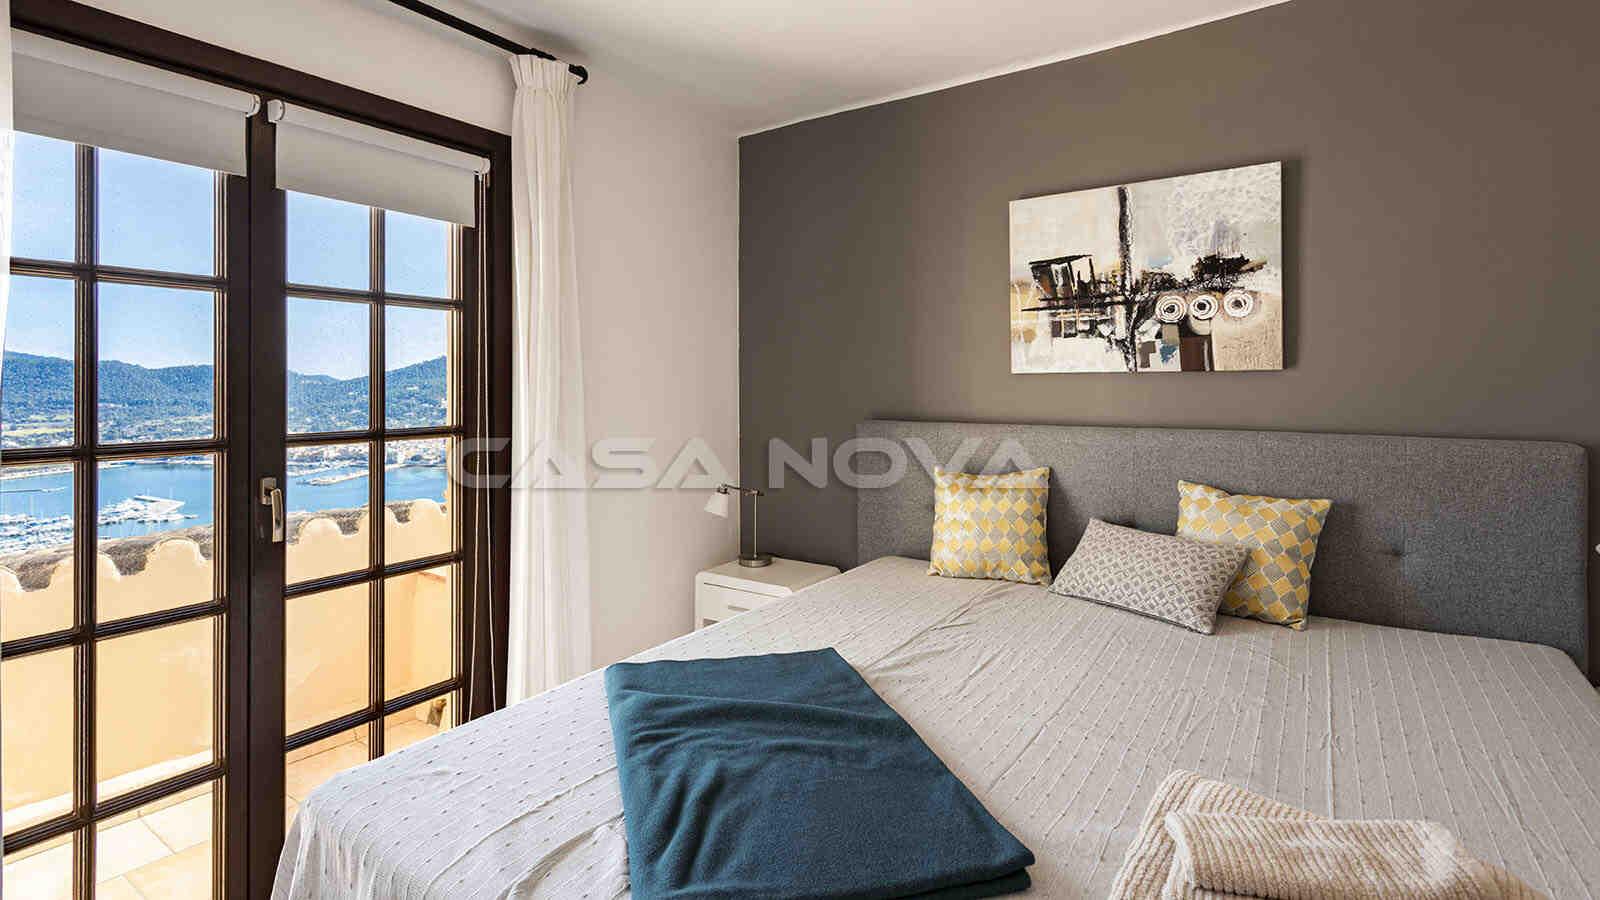 Tolles Haupschlafzimmer mit privater Terrasse